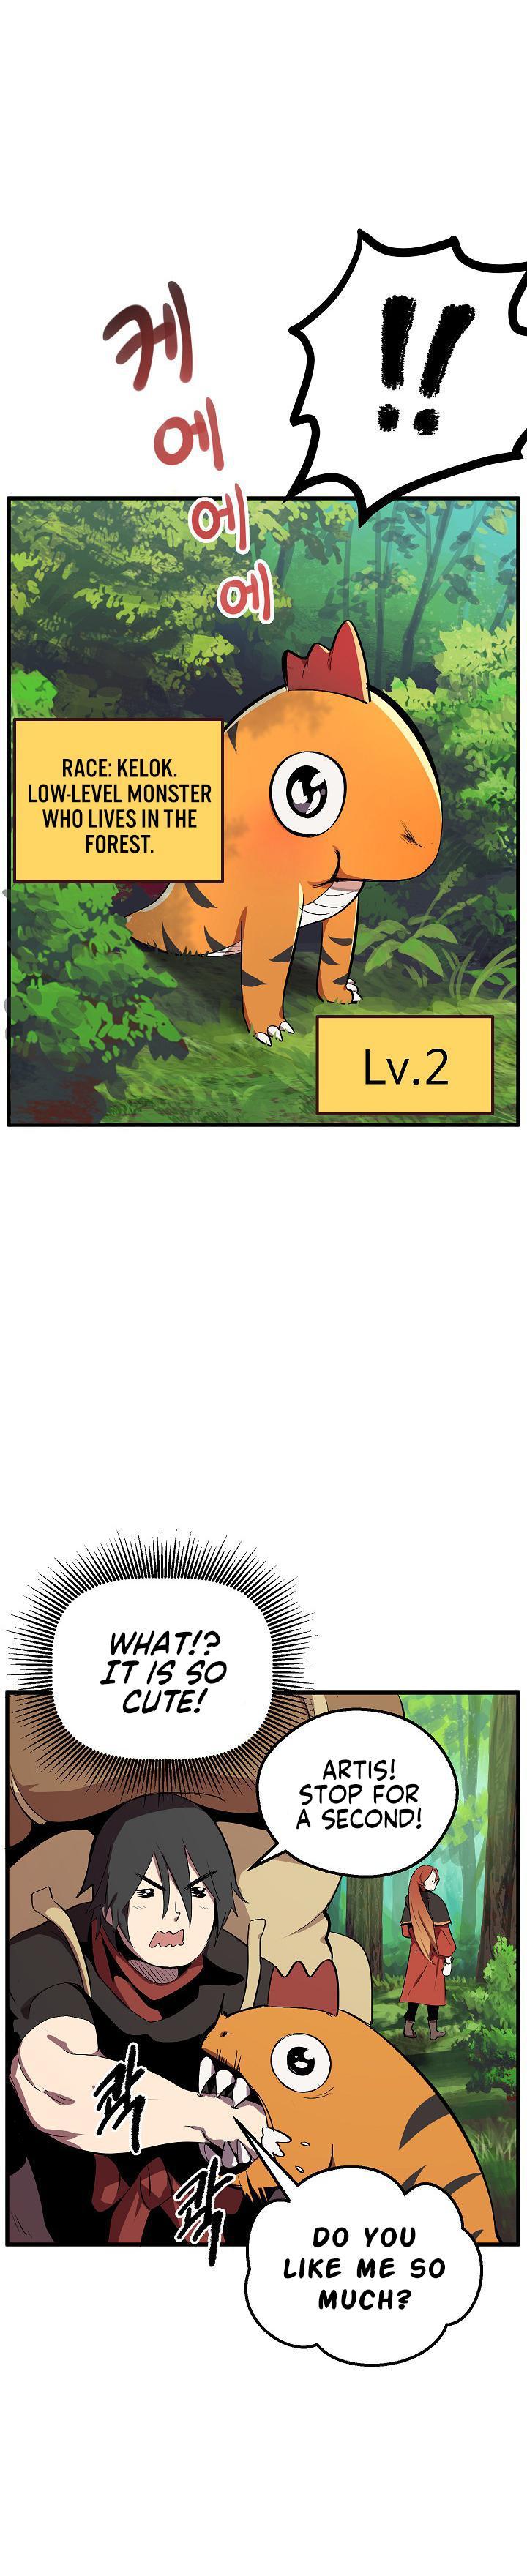 Survival Story Of A Sword King In A Fantasy World Vol.1 Chapter 15 page 18 - Mangakakalots.com